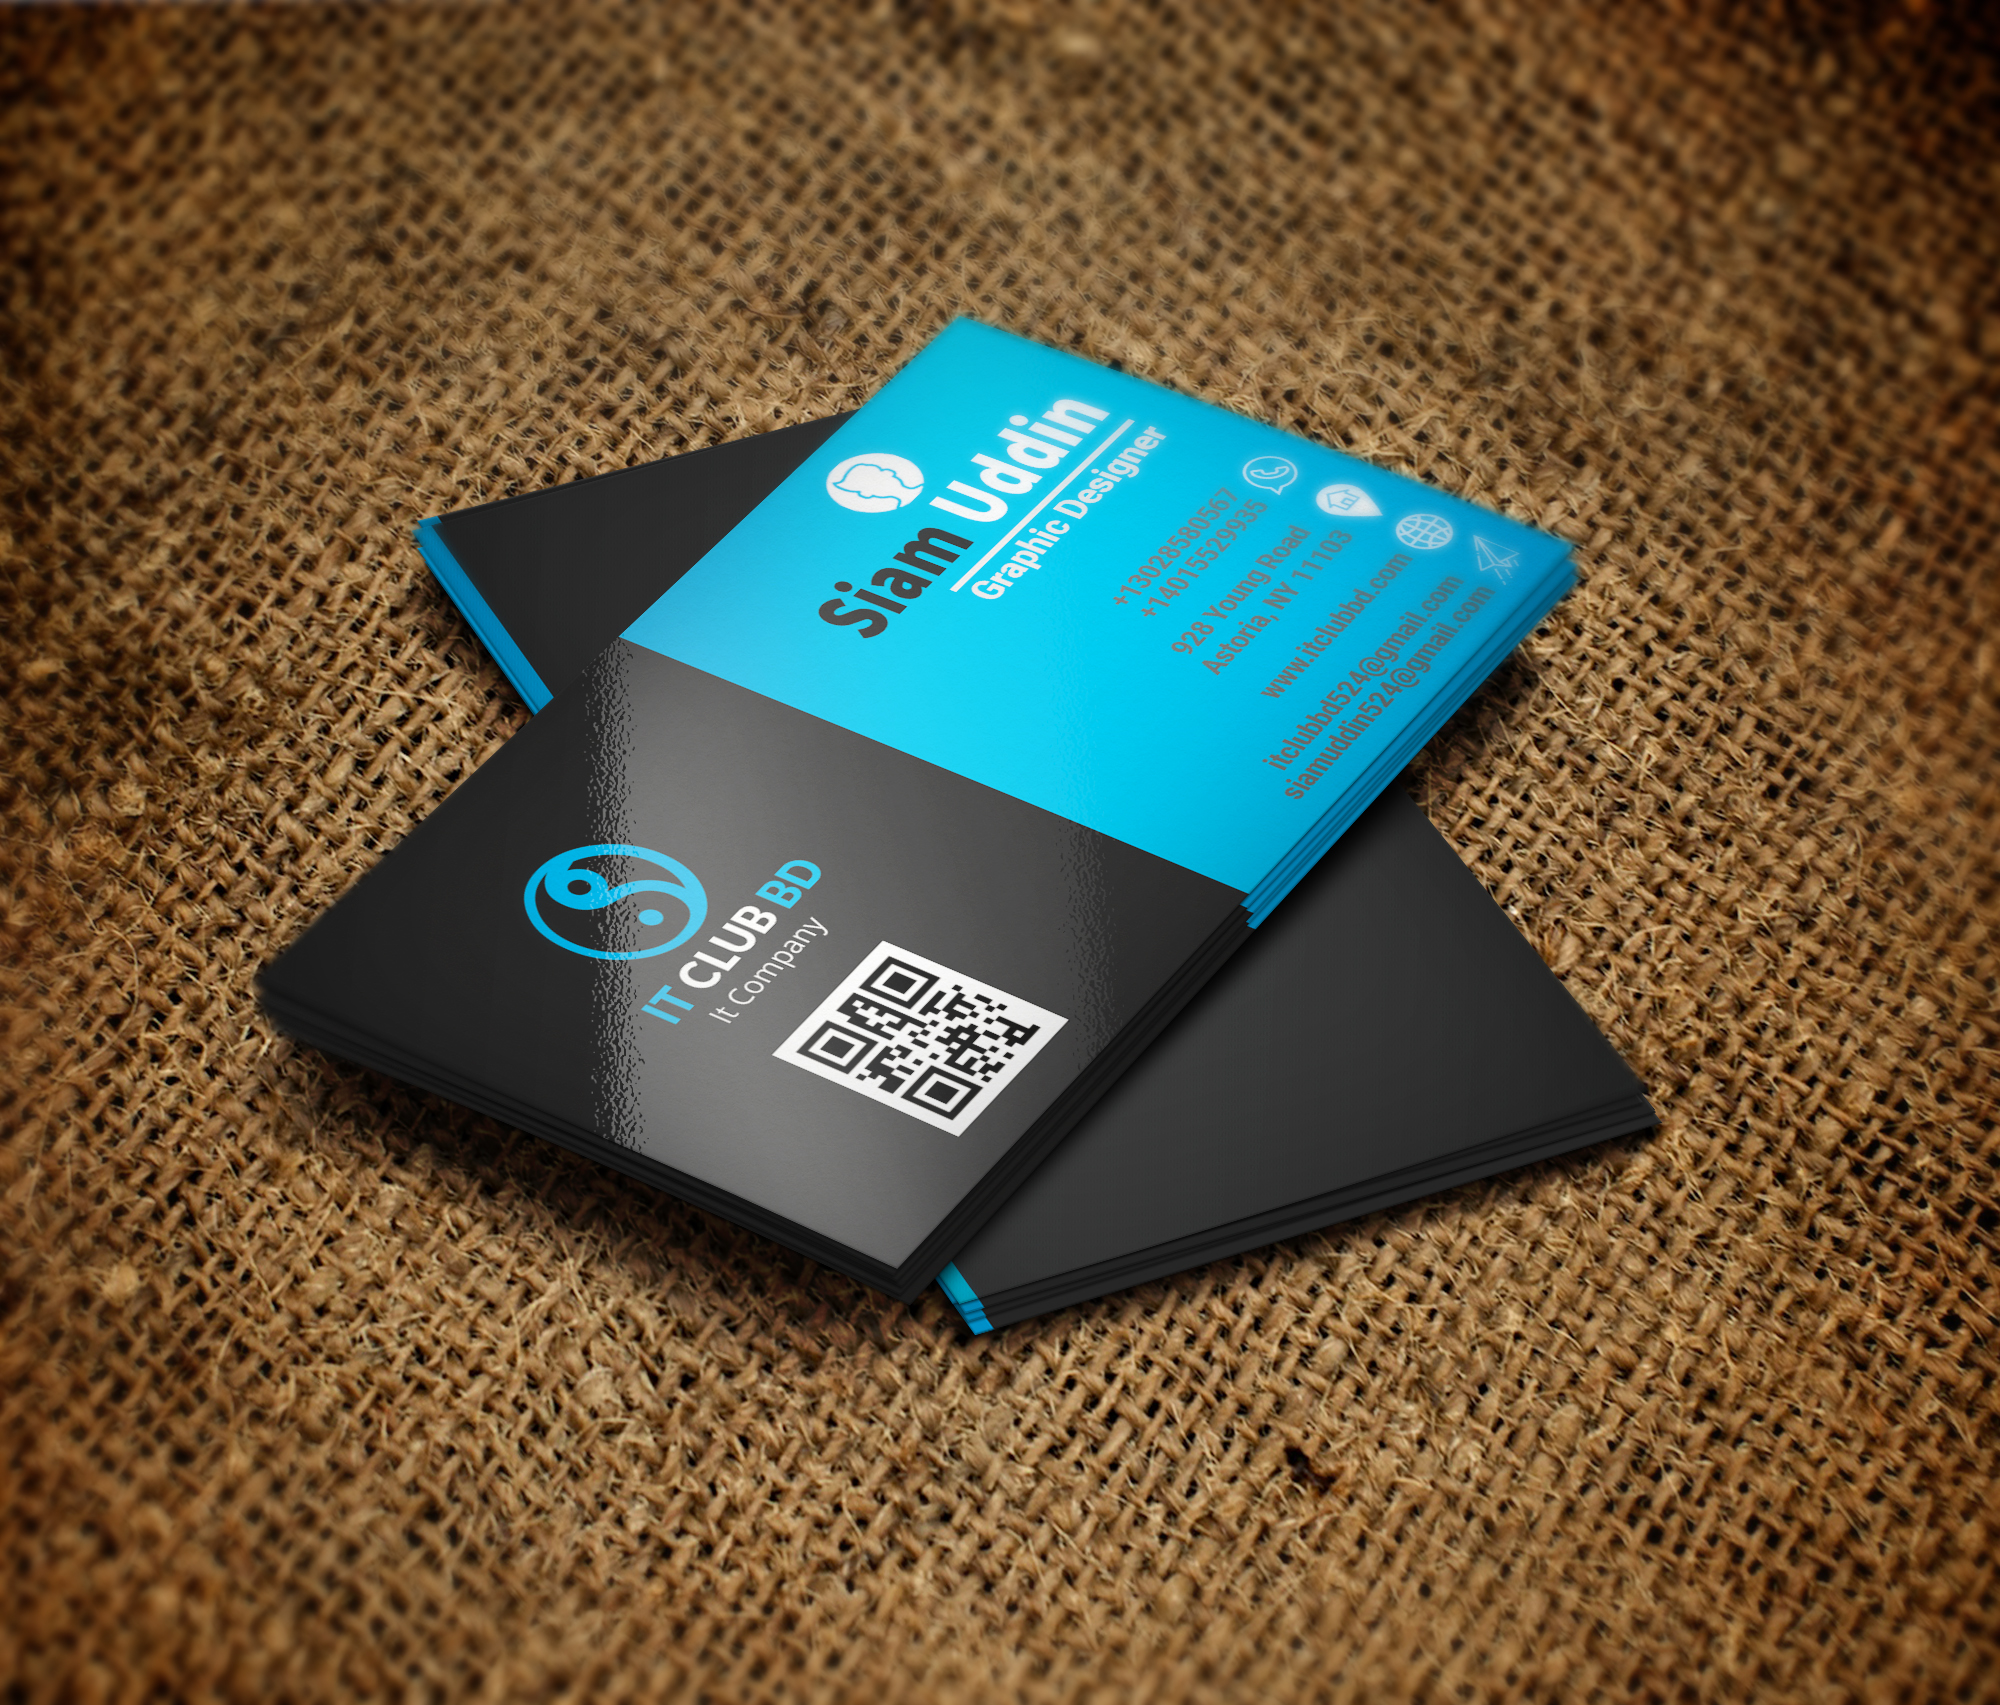 I will do professional business card design 24hr